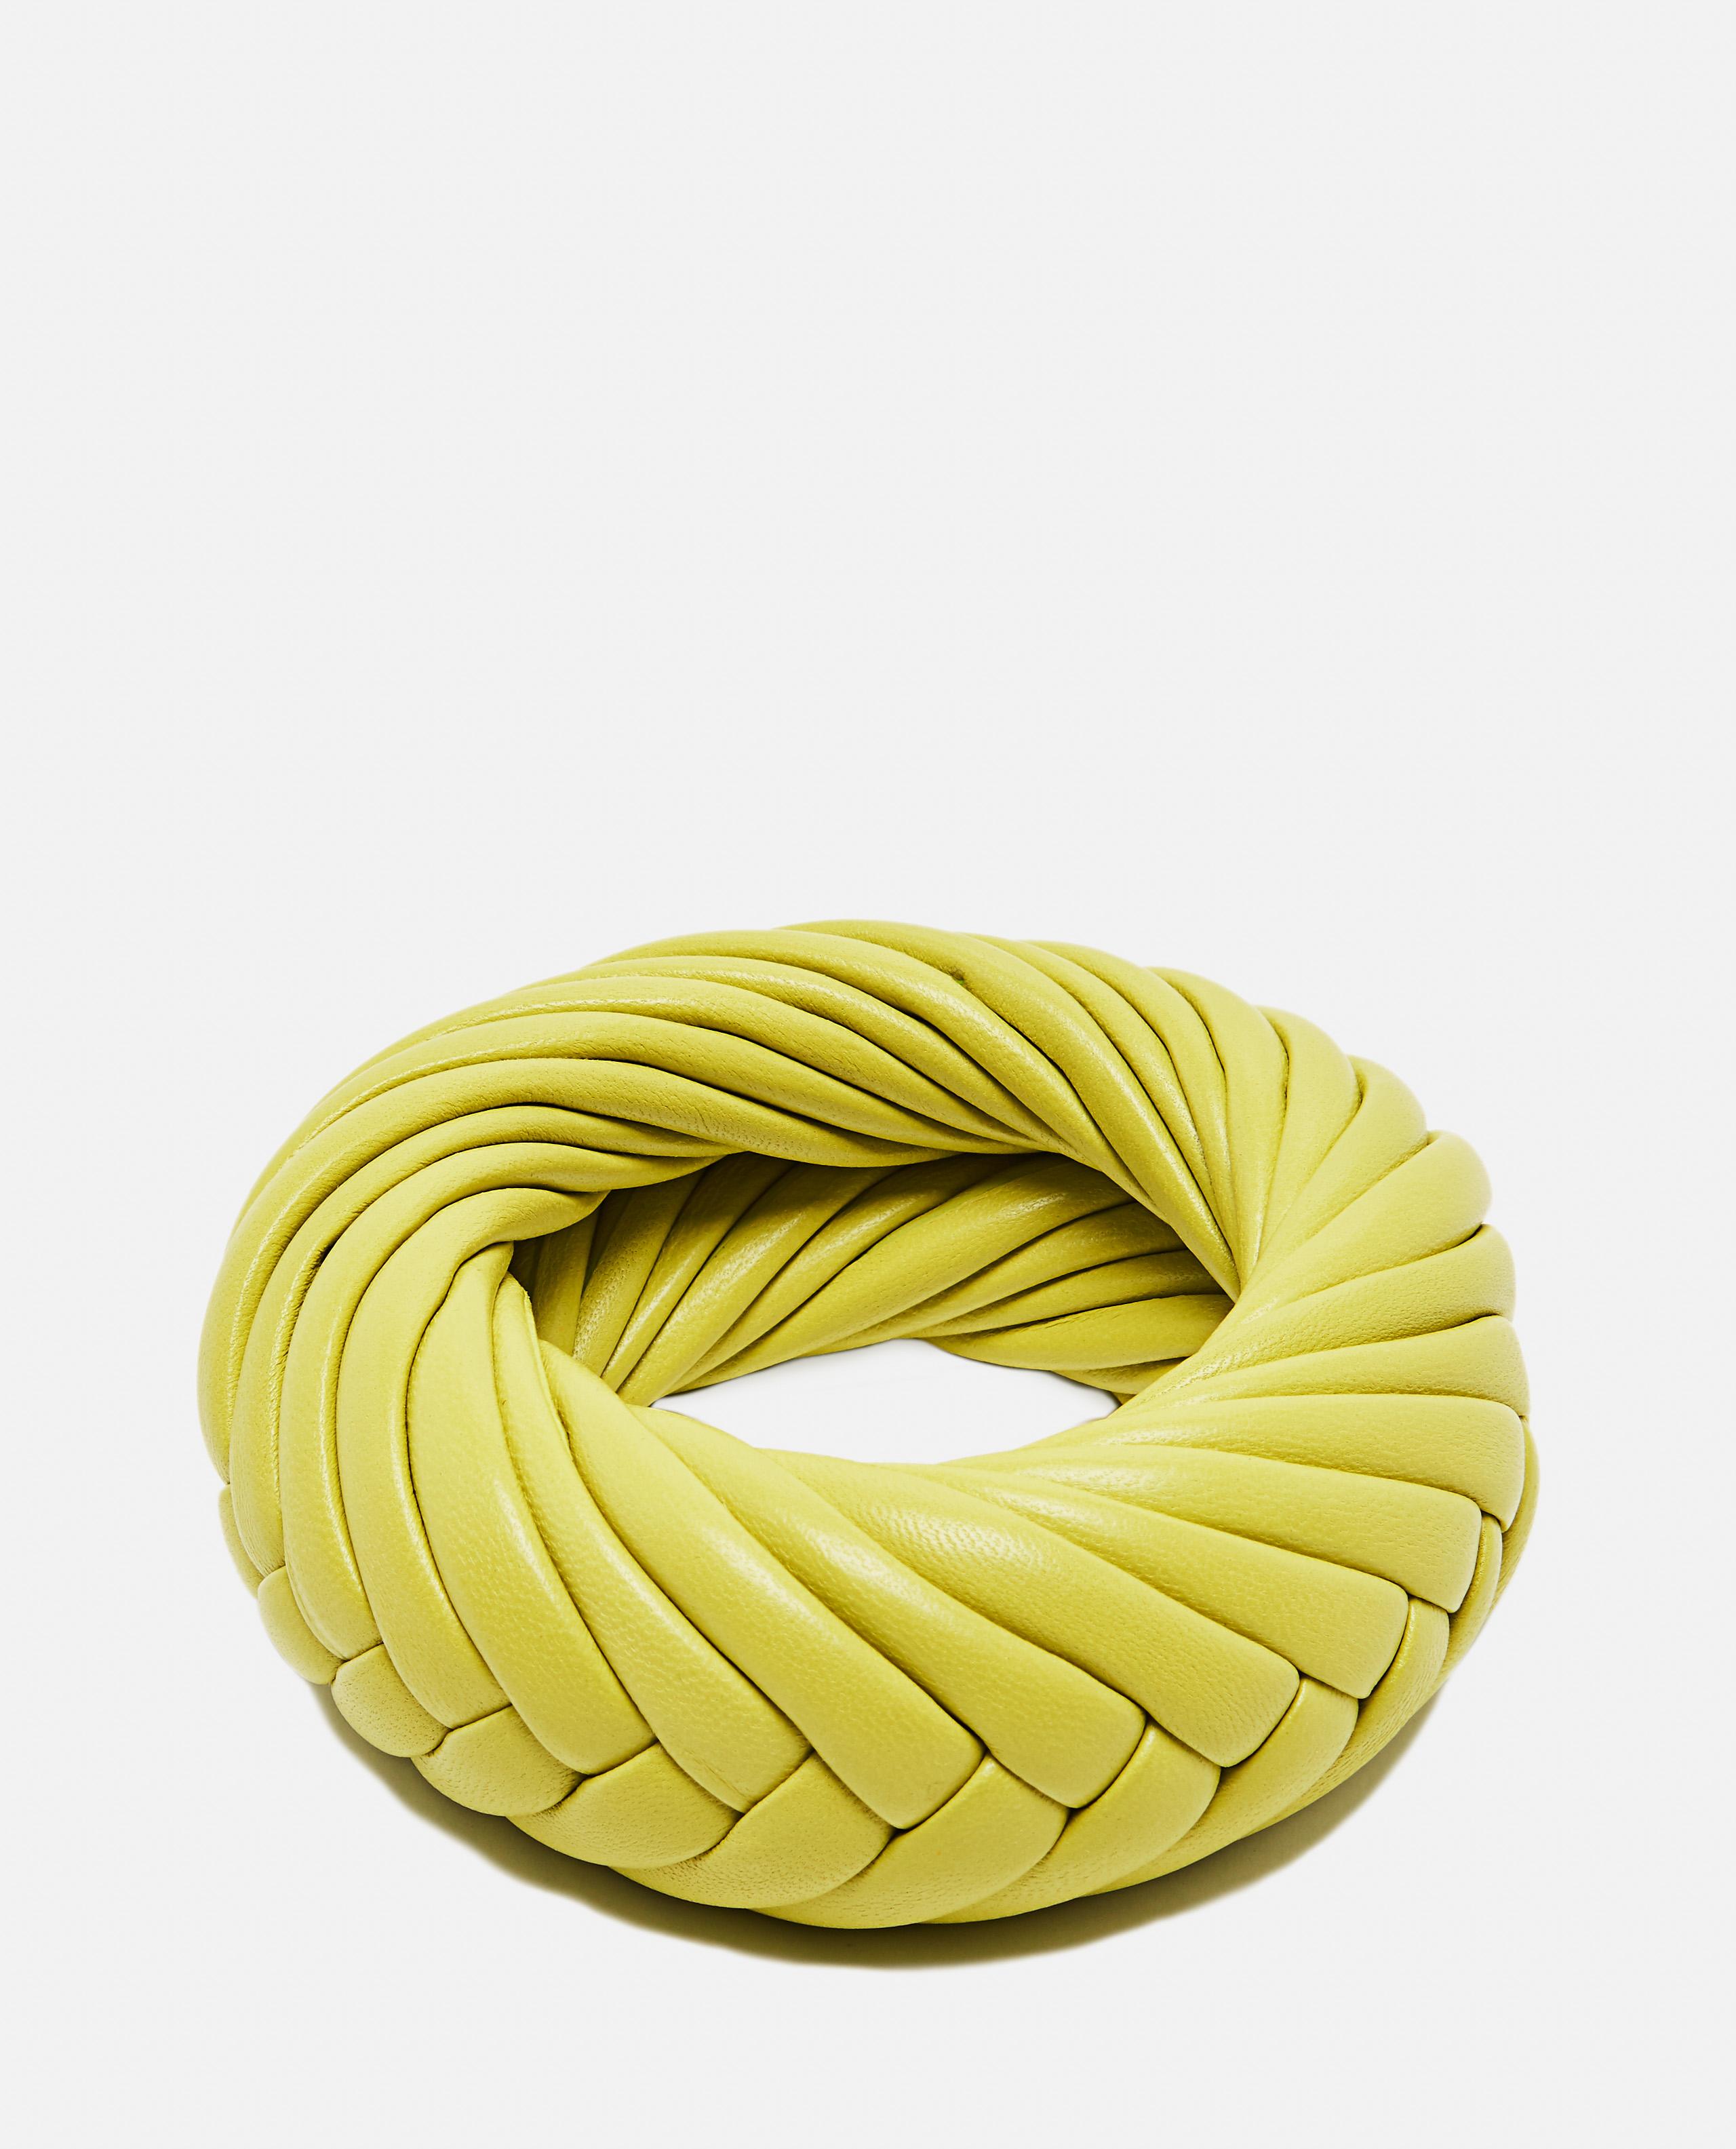 Braided Nappa leather bracelet